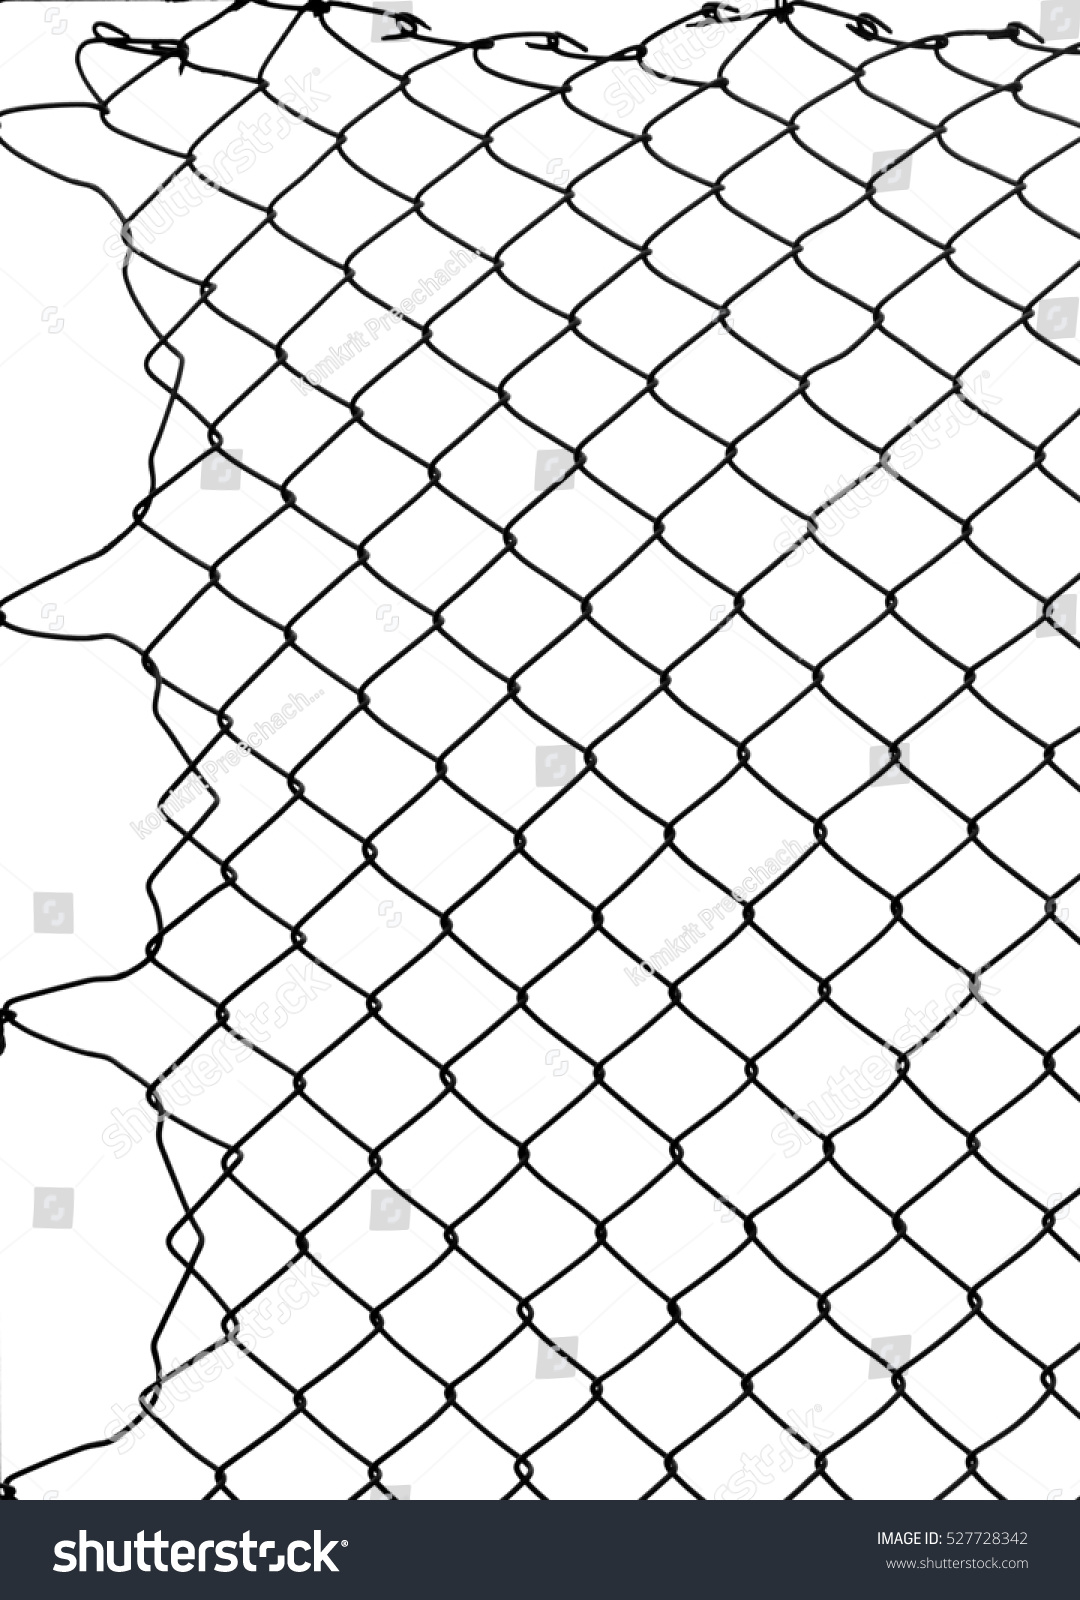 Damage Wire Mesh Stock Photo 527728342 - Shutterstock